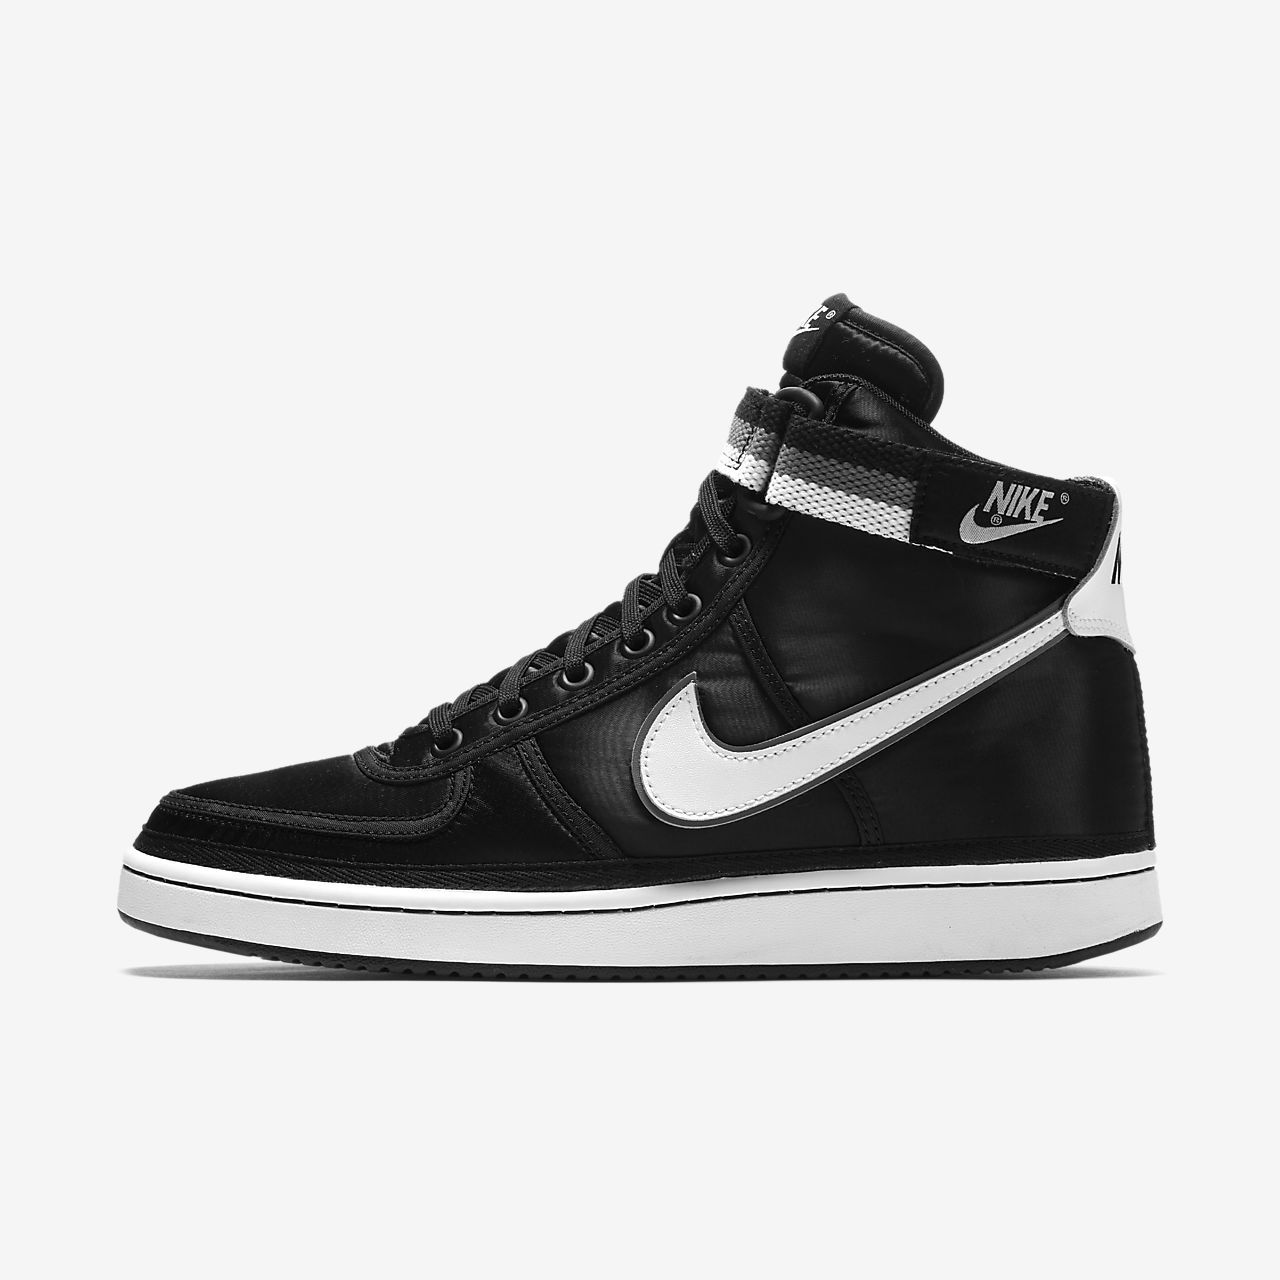 ... Nike Vandal High Supreme Men's Shoe